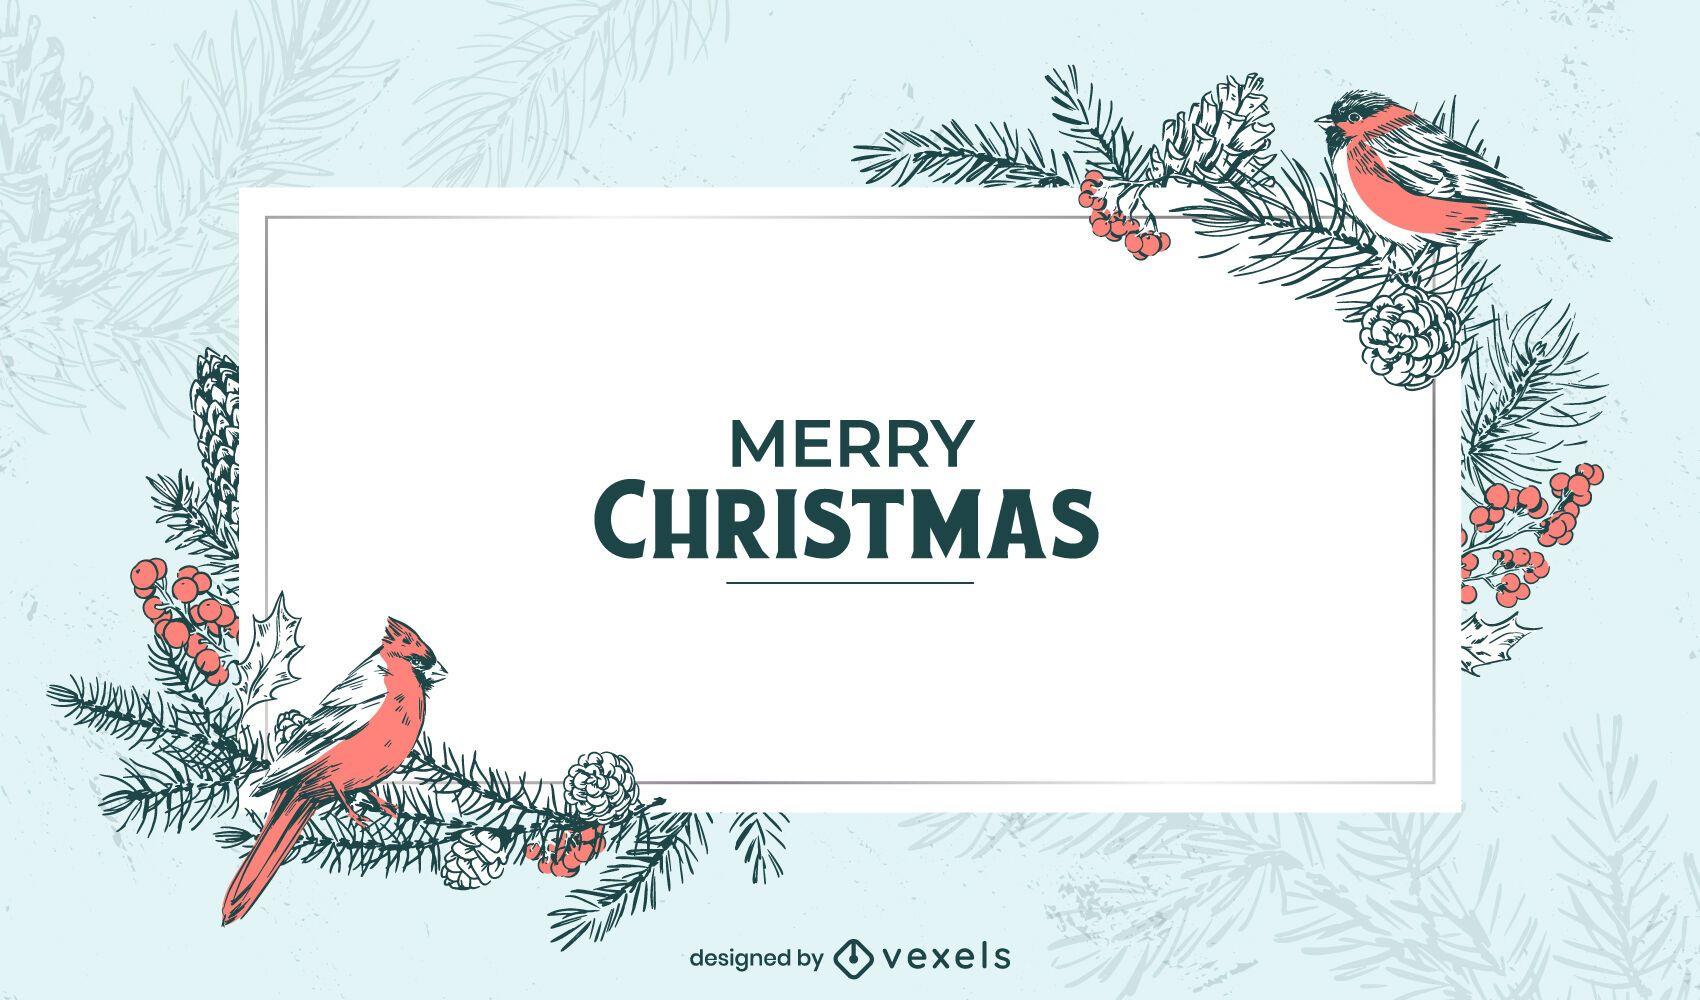 Merry christmas winter background design